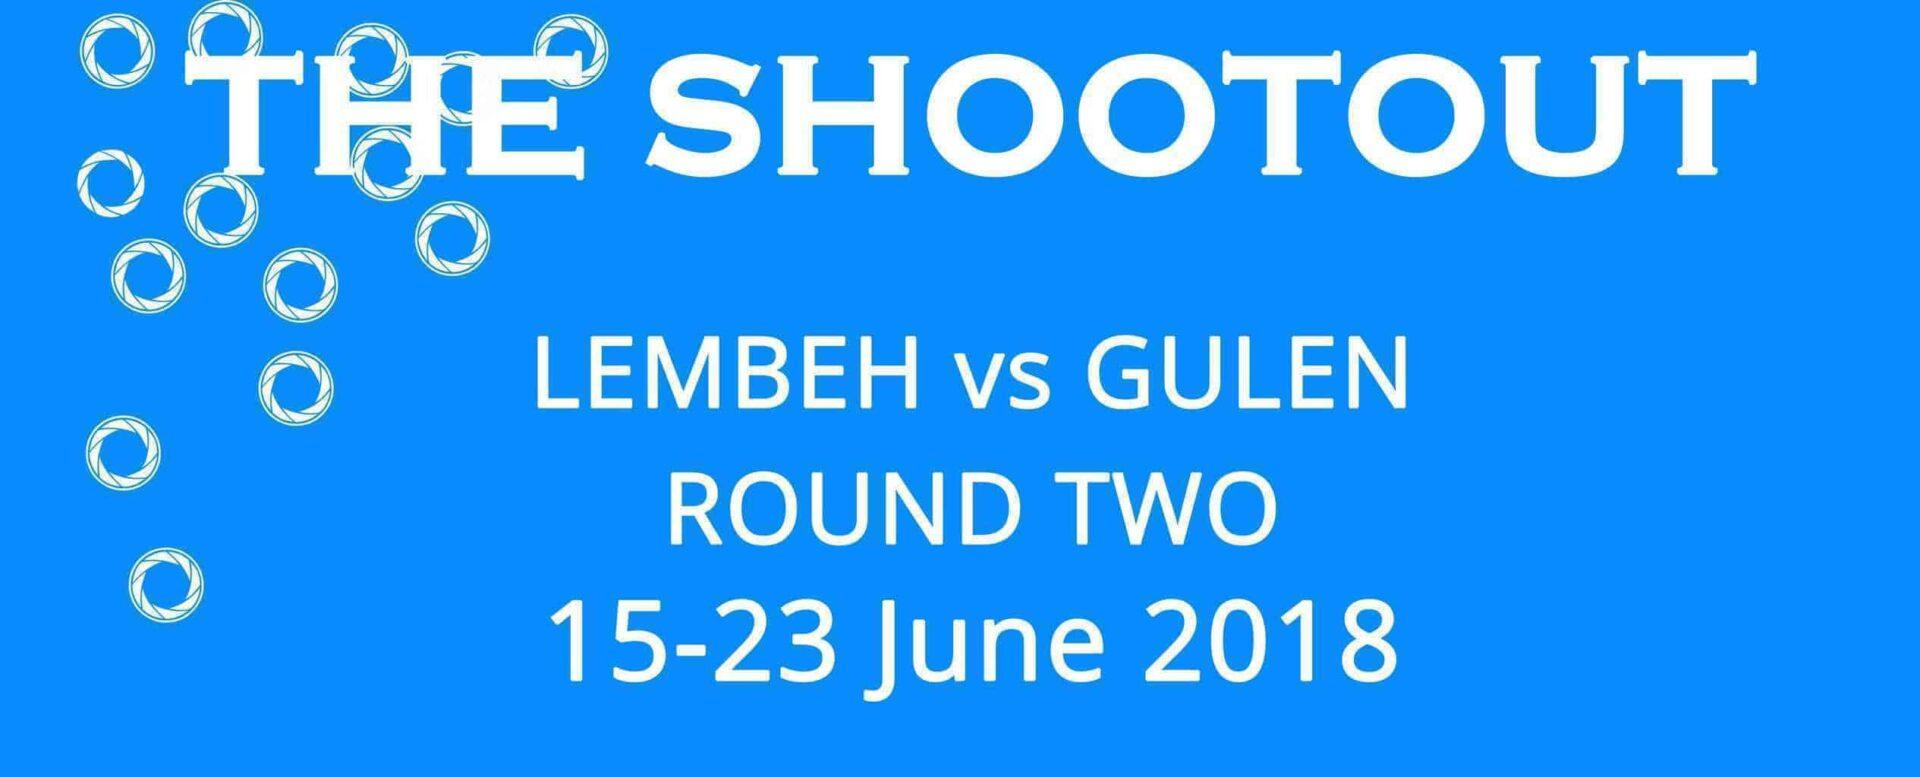 Shootout 5